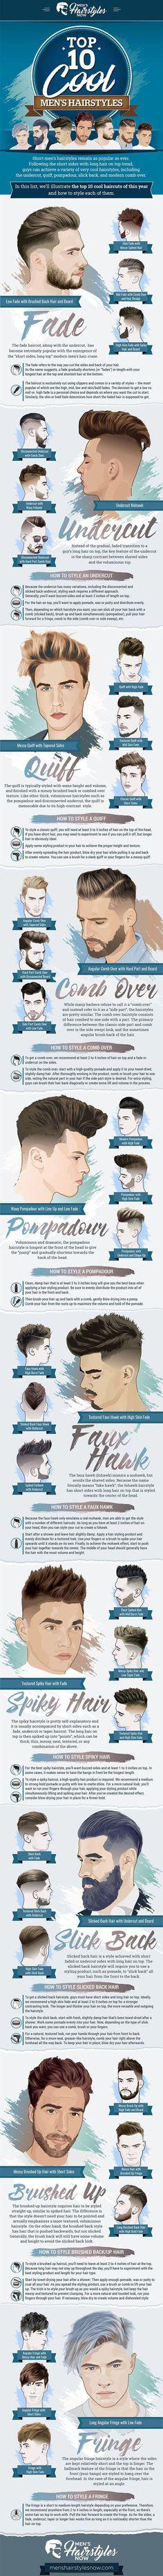 Infographic: Trendiest Hairstyles For Men In 2017 - DesignTAXI.com #MensFashionHairstyles